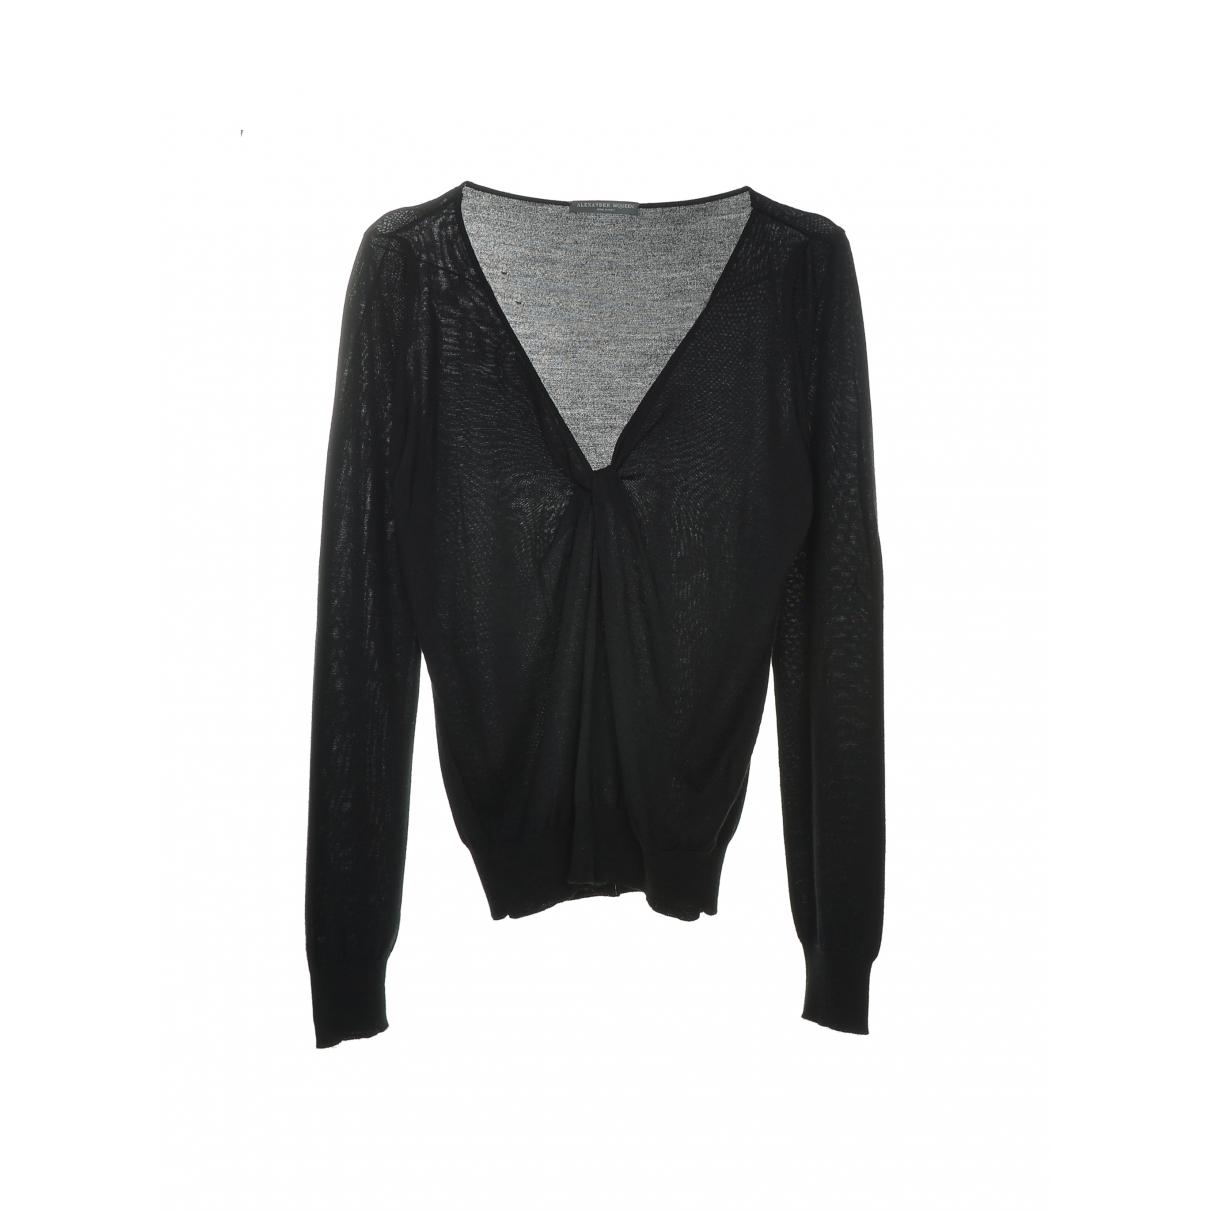 Alexander Mcqueen \N Black Cotton Knitwear for Women S International